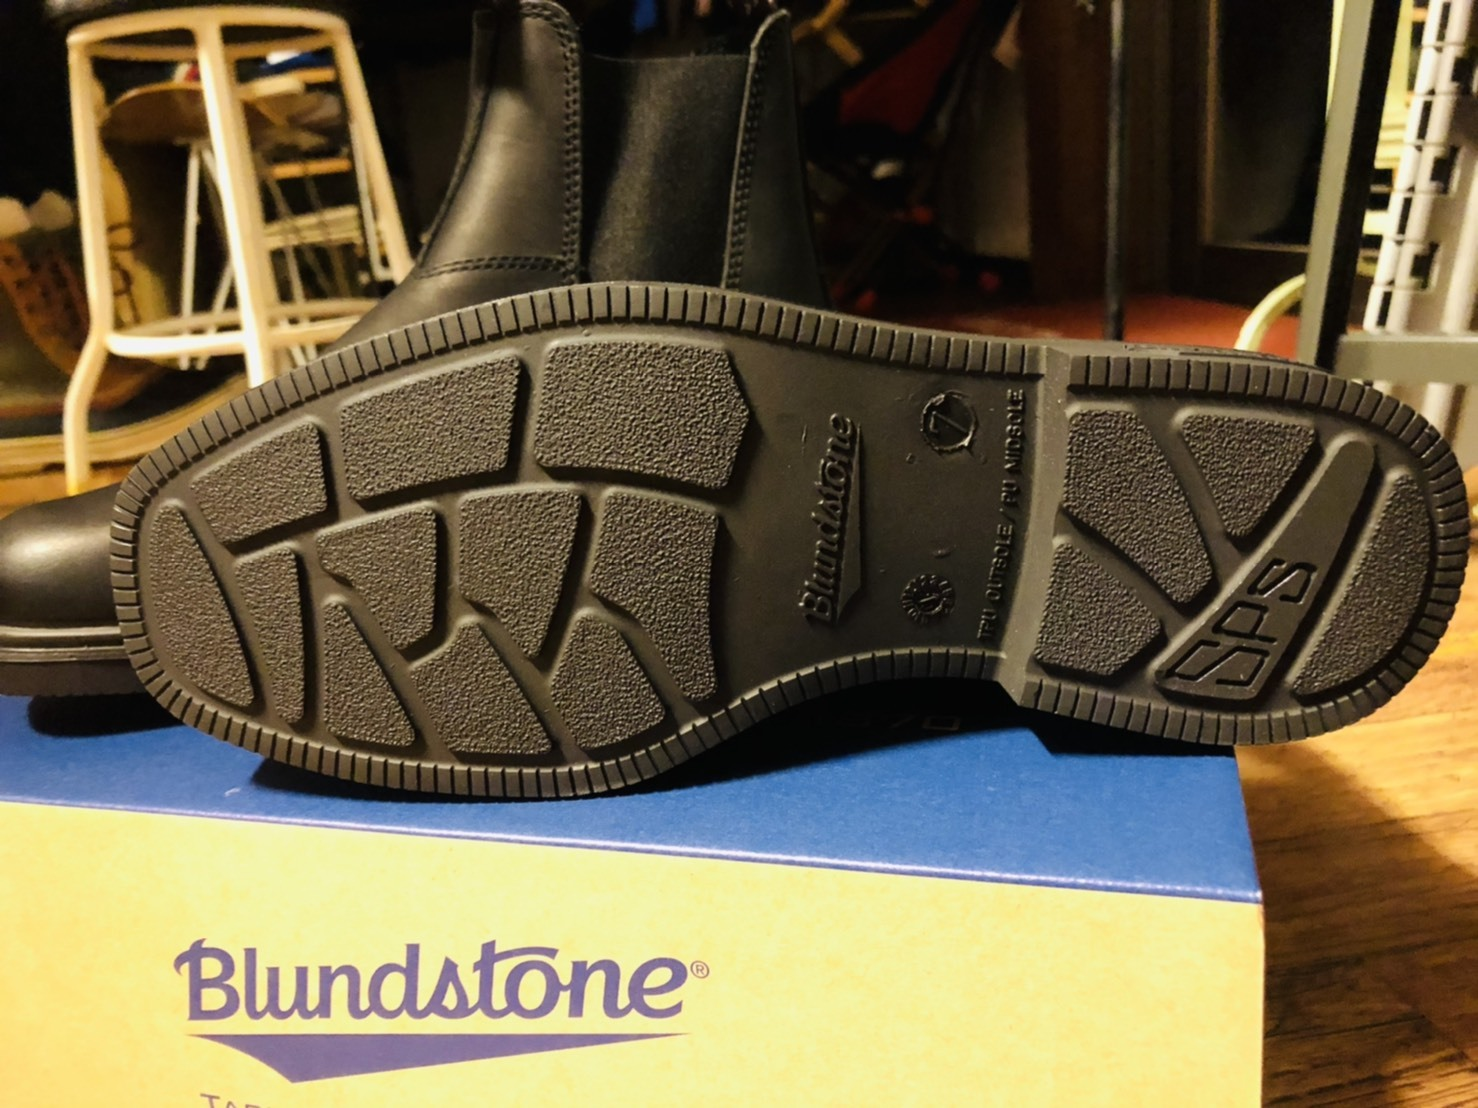 Blundstone #063 DRESS BOOT_b0139233_12310961.jpg